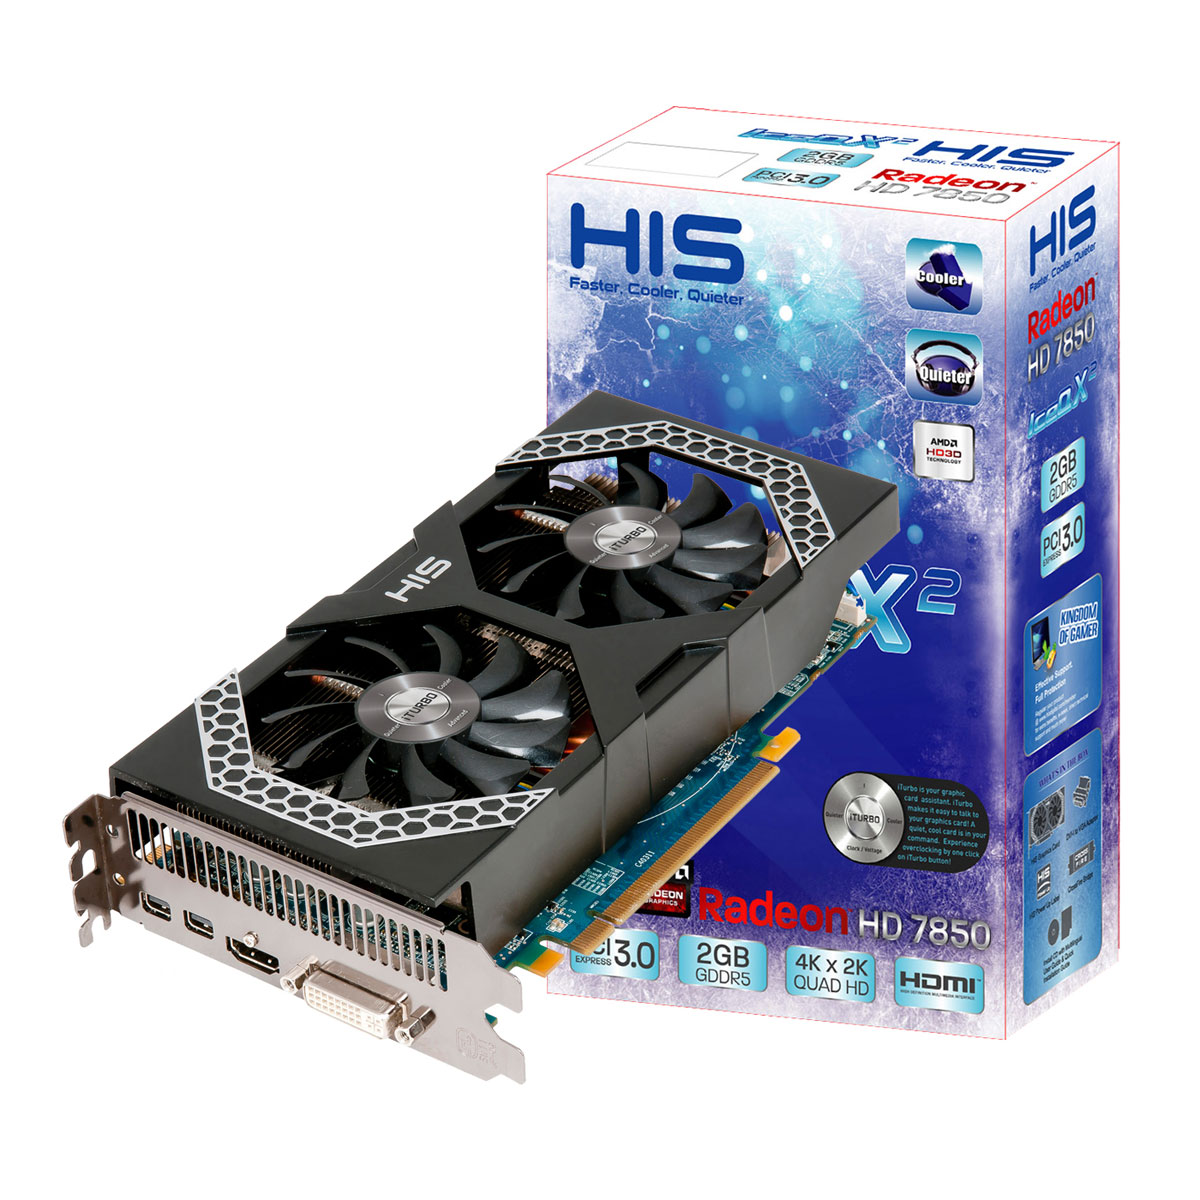 Carte graphique HIS 7850 iPower IceQ X² 2GB 2 Go HDMI/DVI/Dual Mini-DisplayPort - PCI Express (AMD Radeon HD 7850)